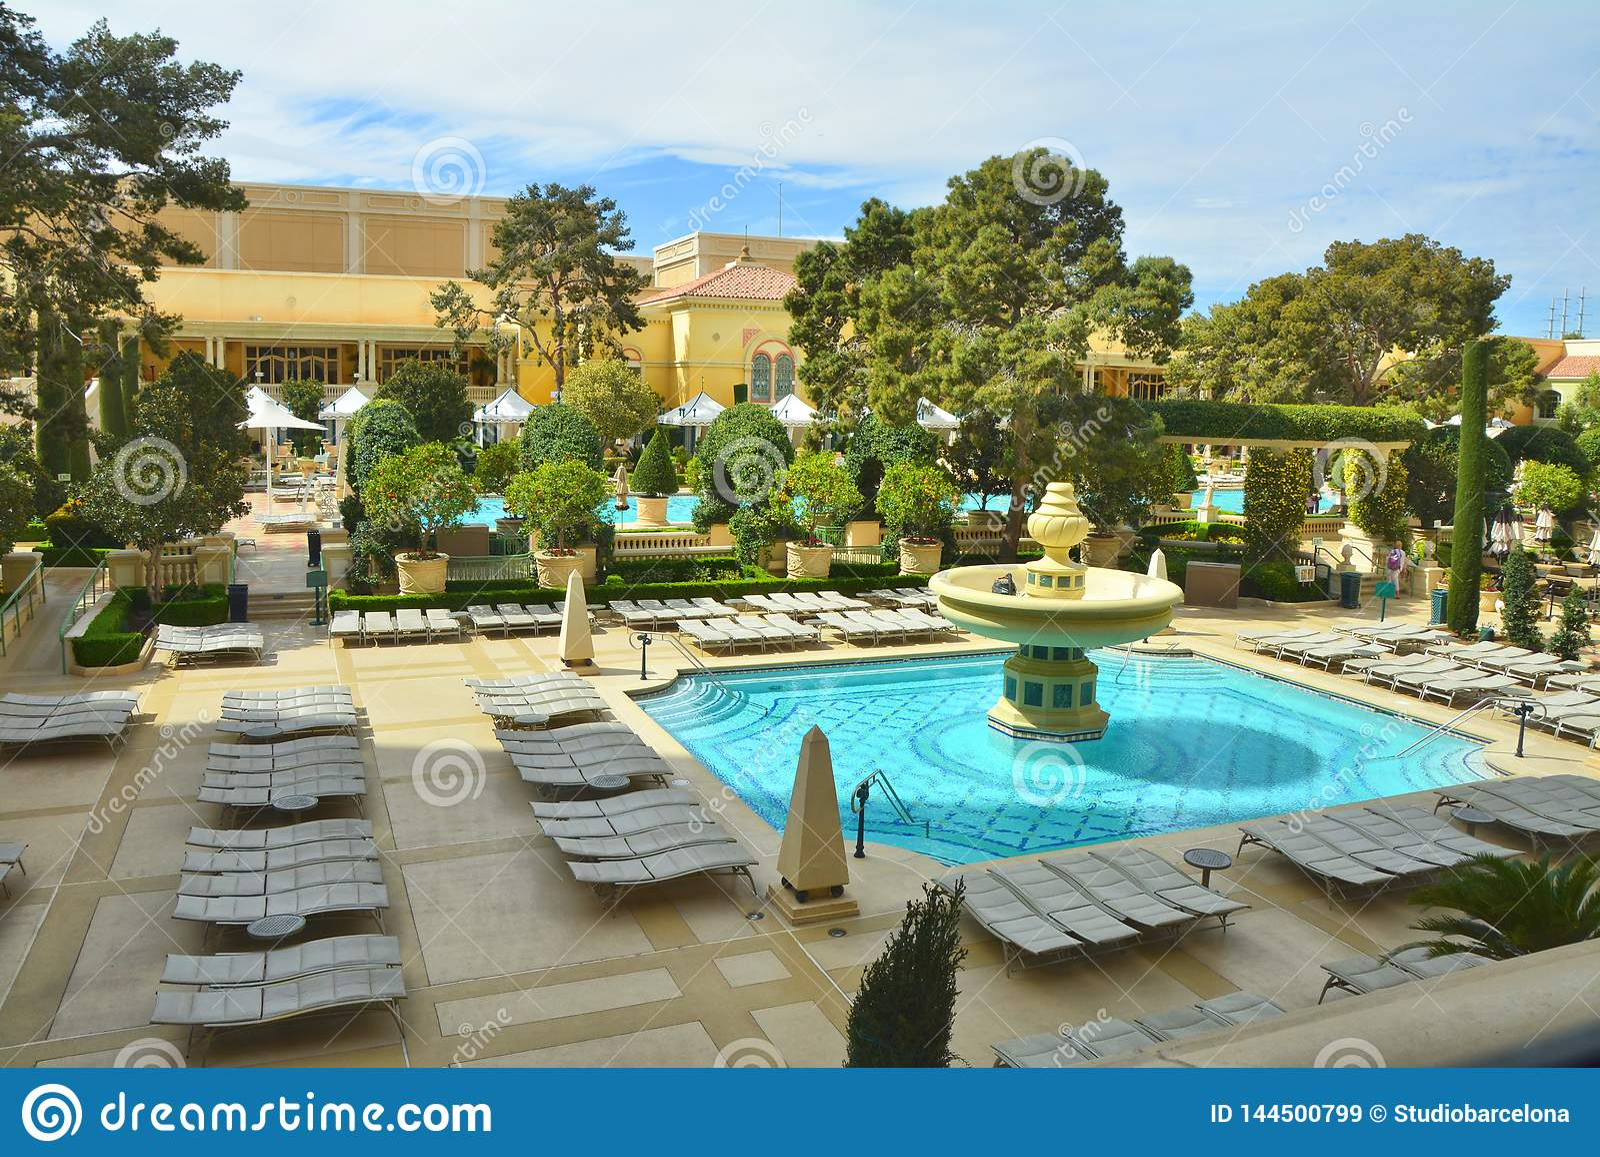 Pools And Garden At Bellagio Hotel Casino Editorial Stock Image Image Of Landmark Strip 144500799